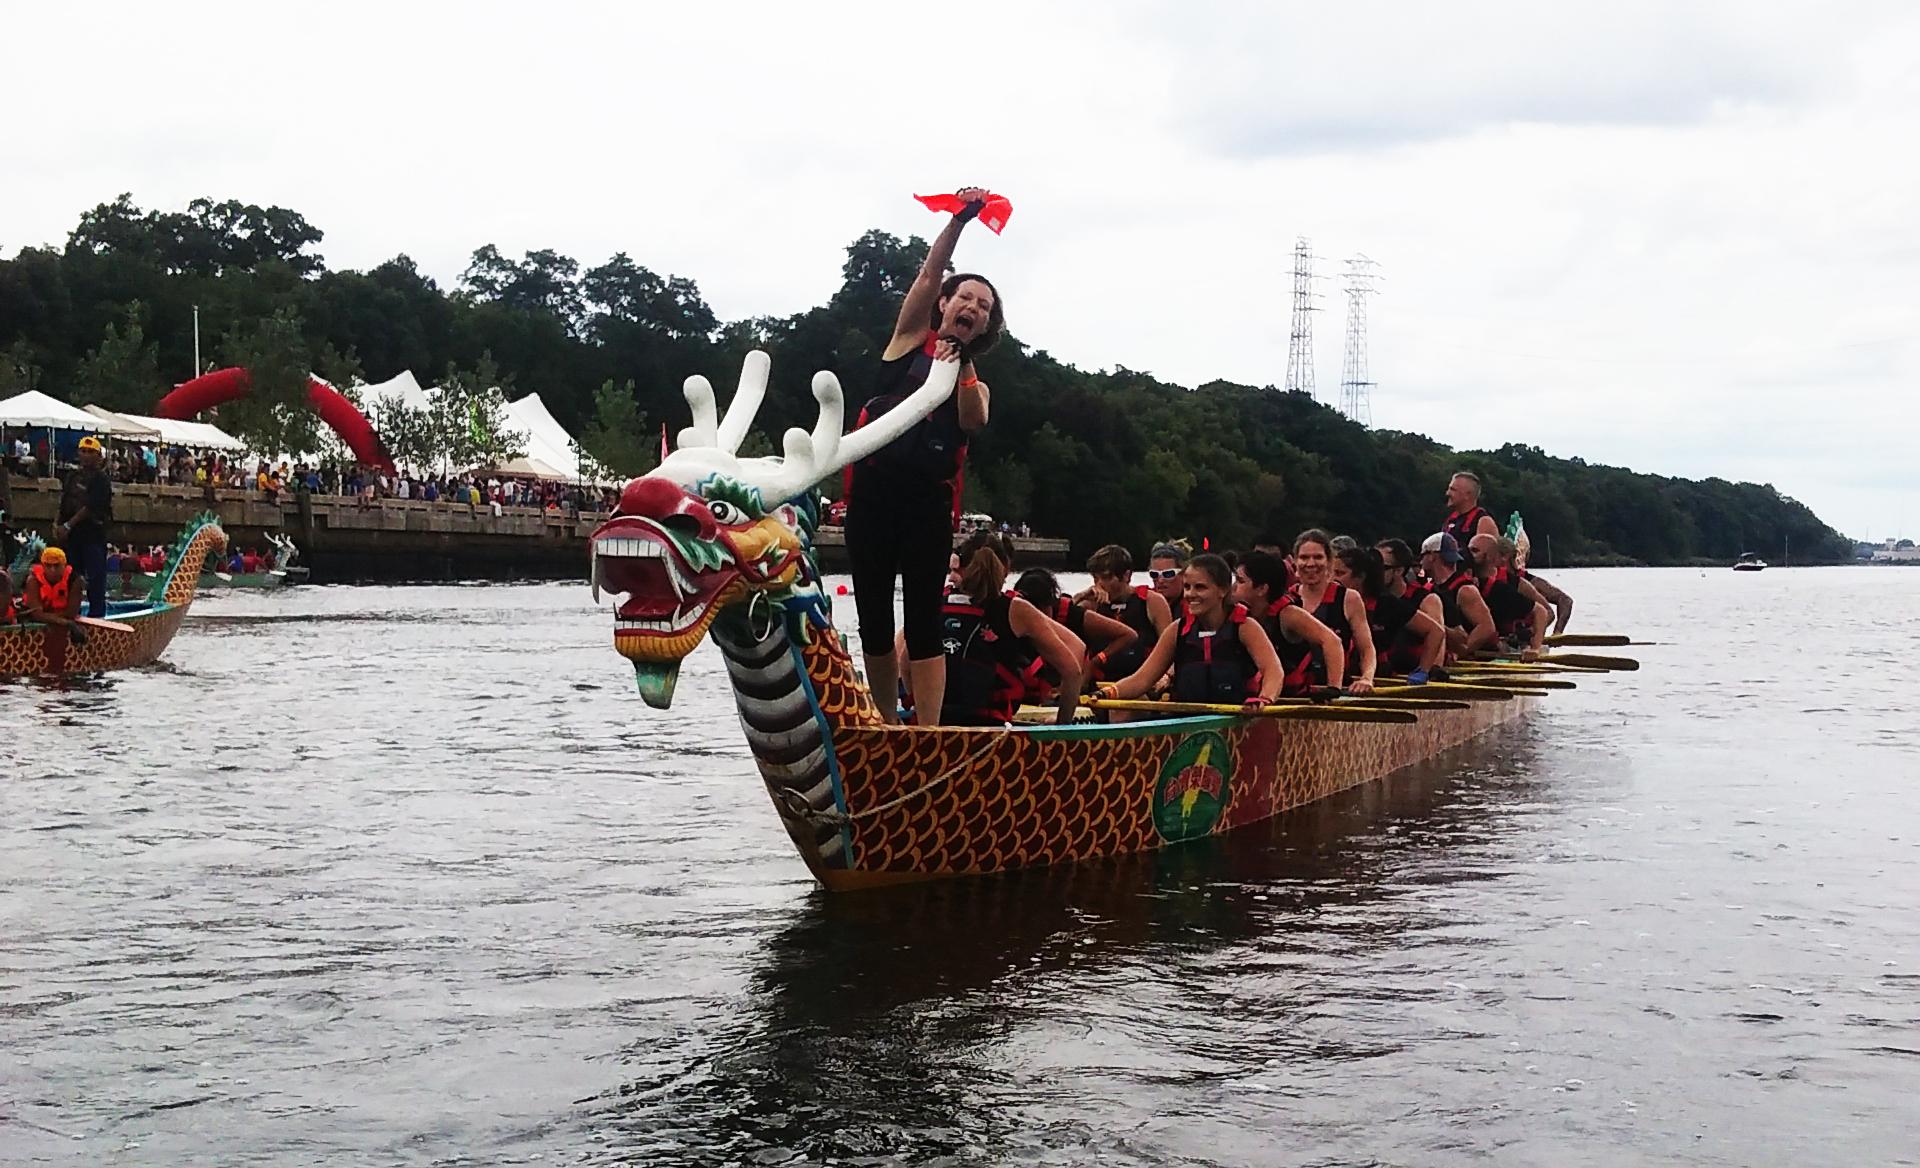 James Toomey - RI Dragon Boat Fest_winner with flag.jpg